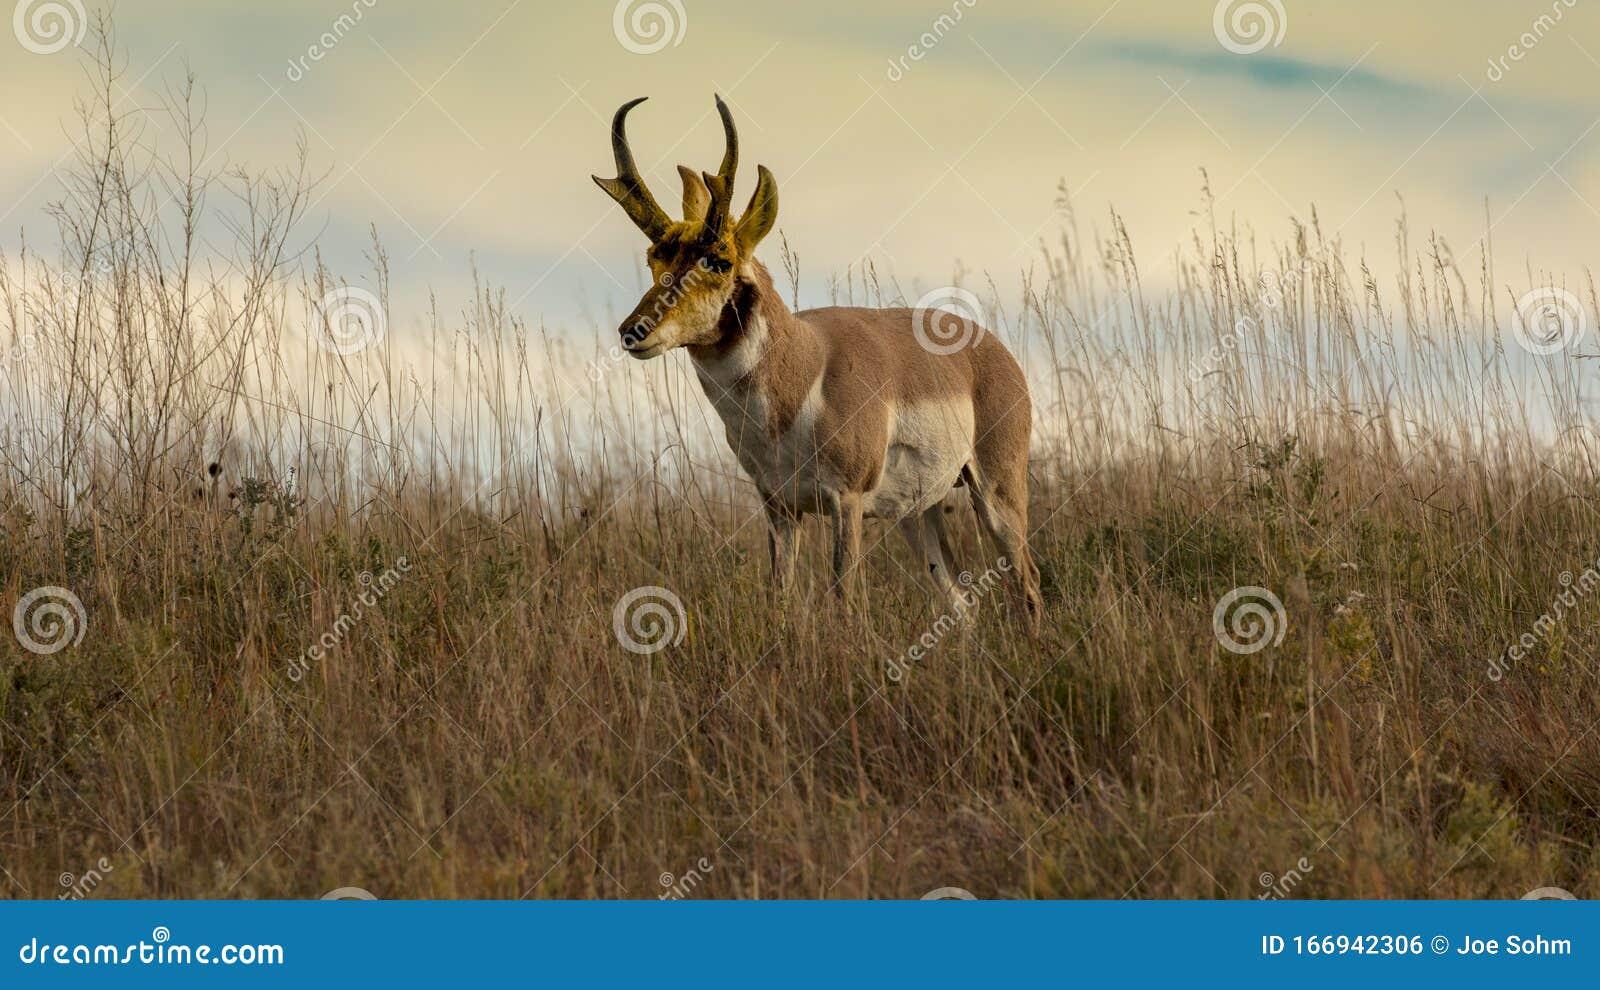 Pronghorn Antelope Fastest Animal In North America Custer State Park South Dakota Stock Photo Image Of Blue Landscape 166942306